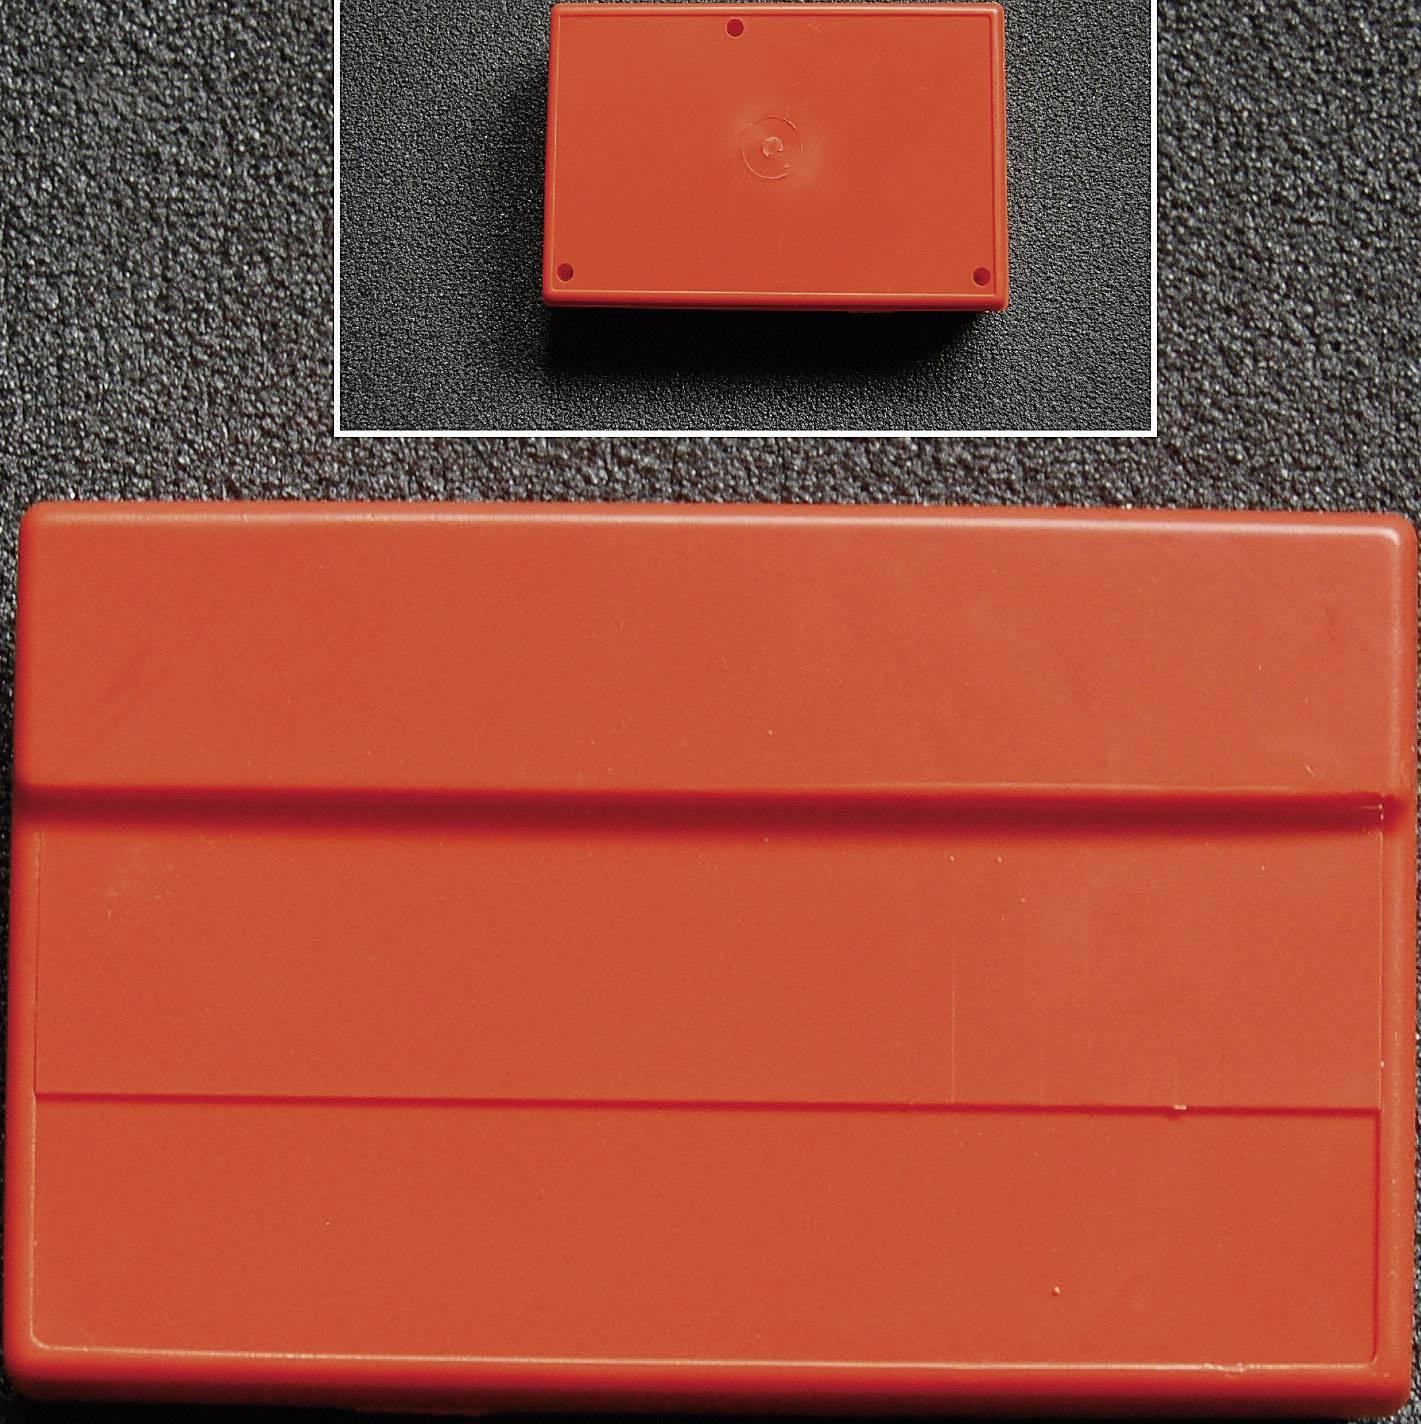 Pultové pouzdro 162 x 104 x 50 ABS černá WeroPlast HITPULT 3005 1 ks